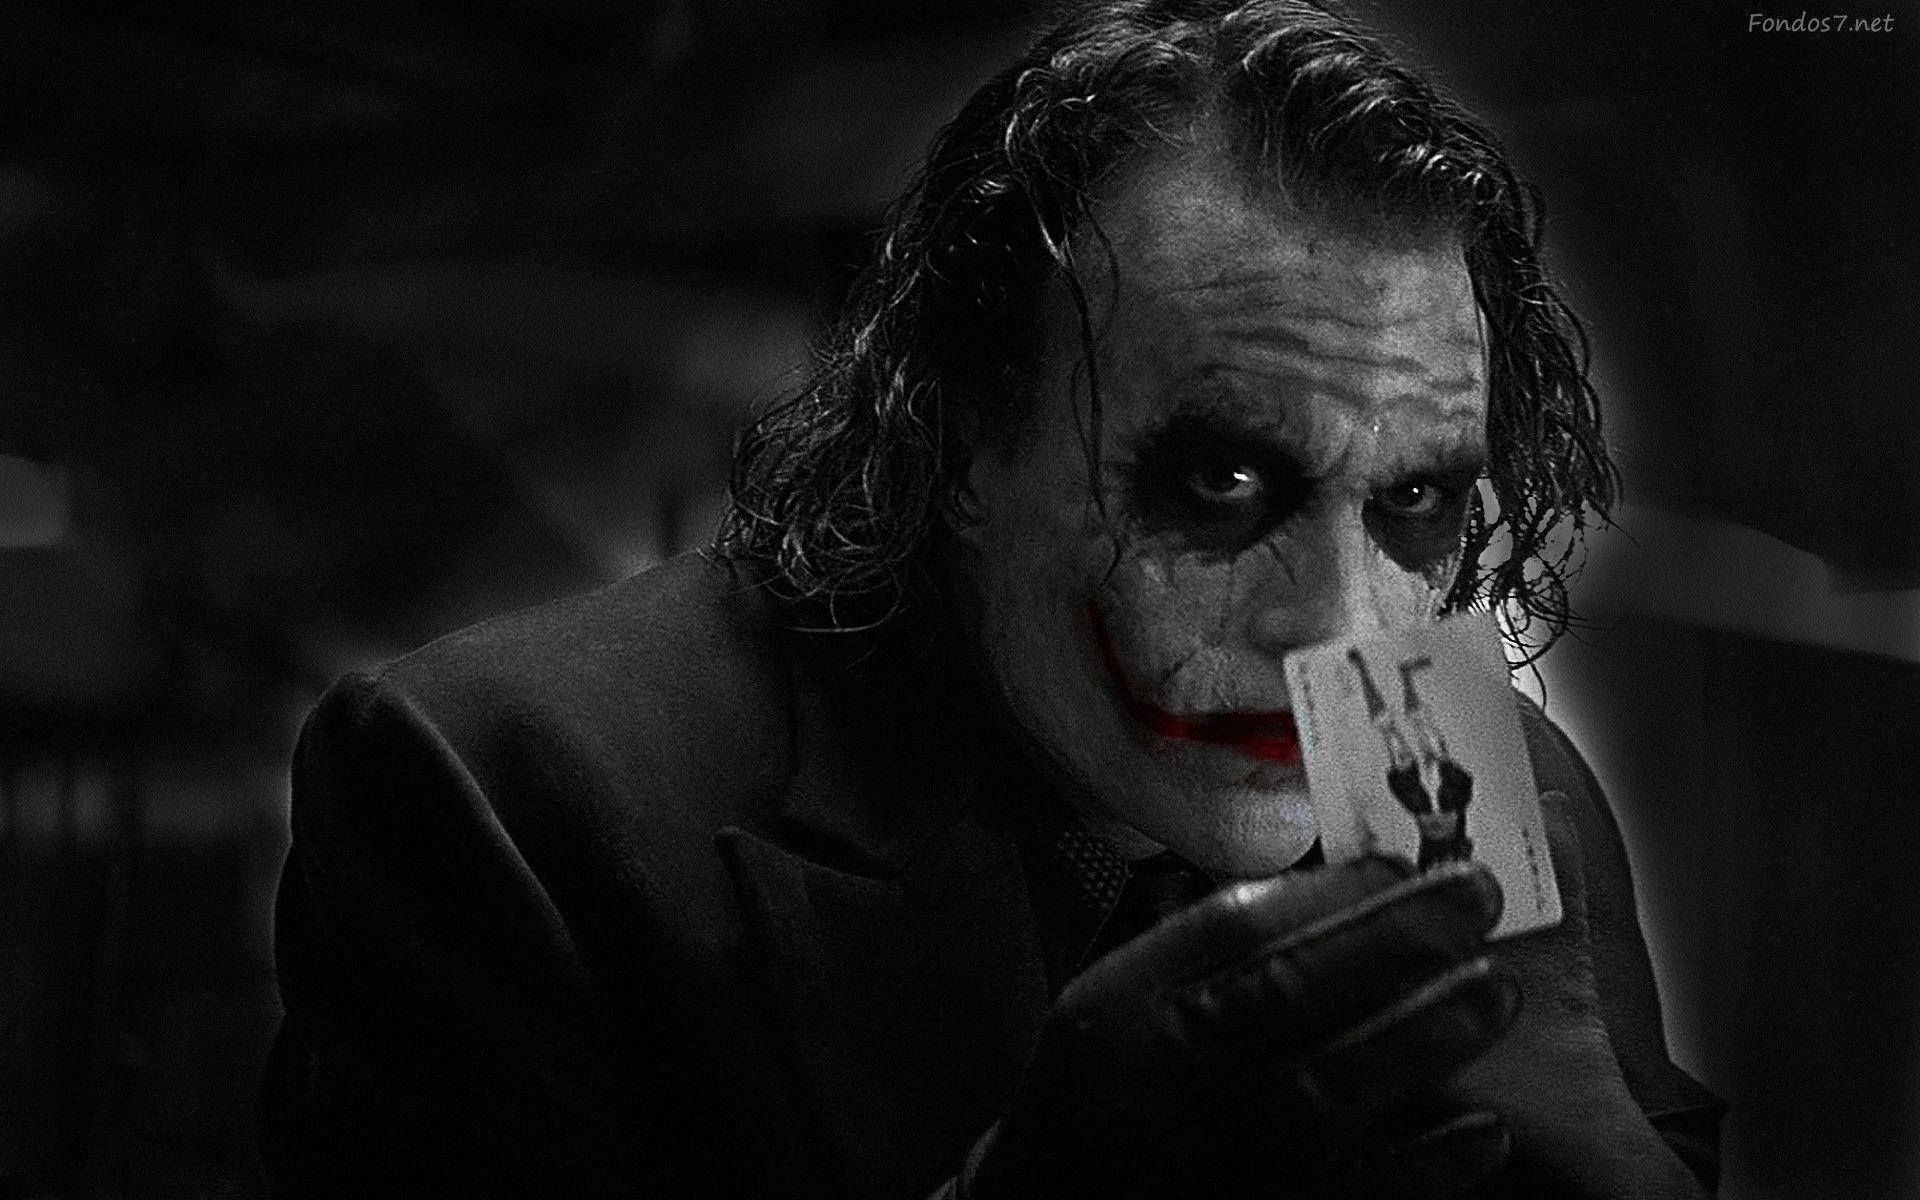 Dark Joker Wallpaper Best Wallpaper Hd Dark Knight Wallpaper Joker Wallpaper Joker Dark Knight